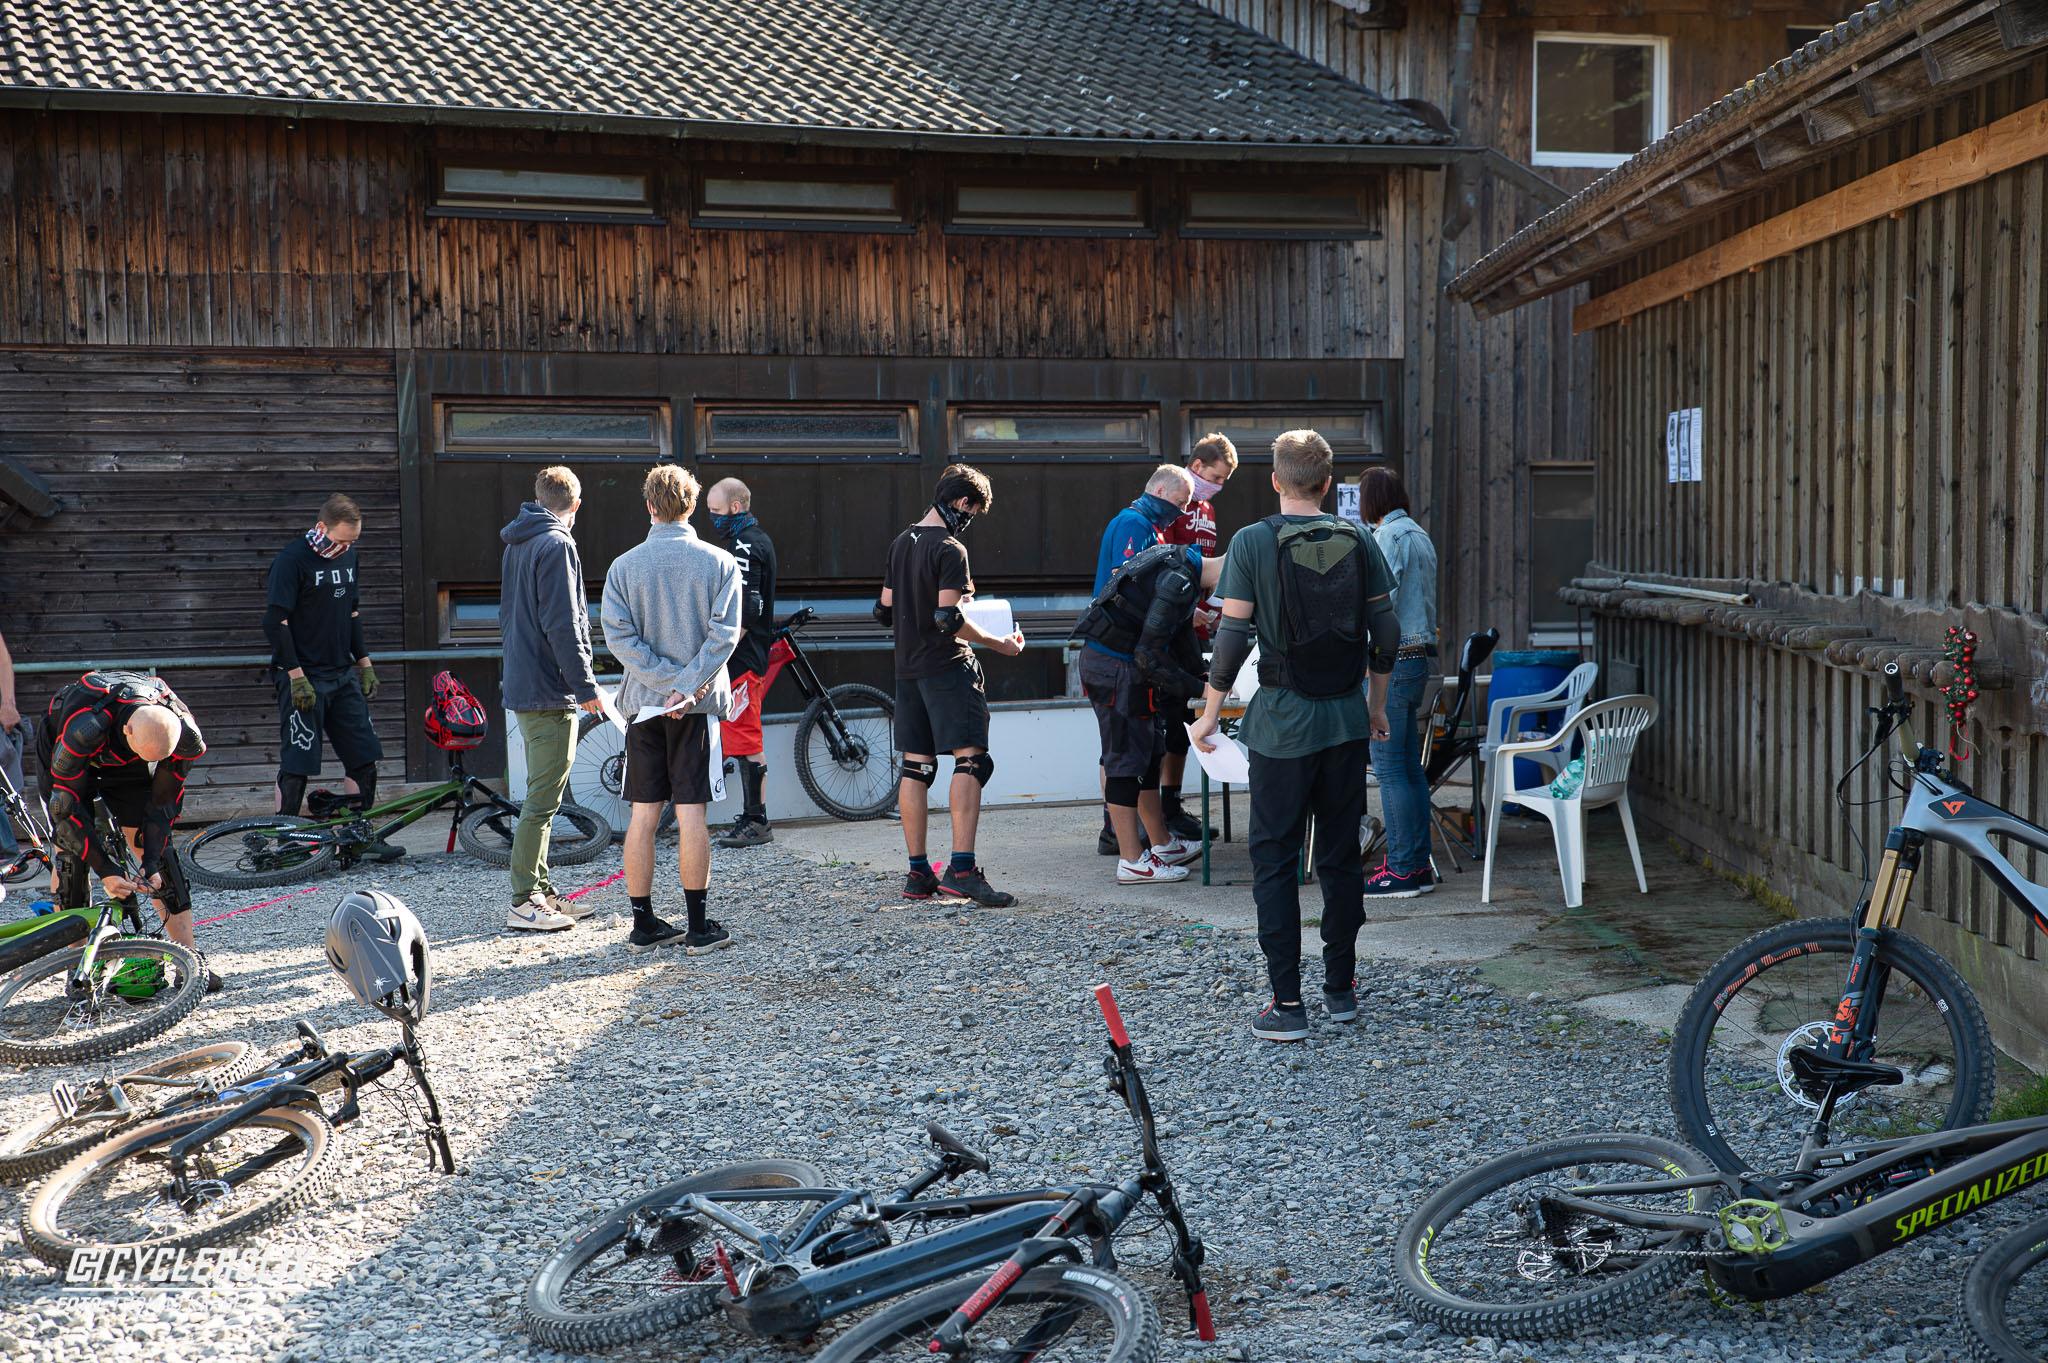 2020 Bikepark Grosserlach 11